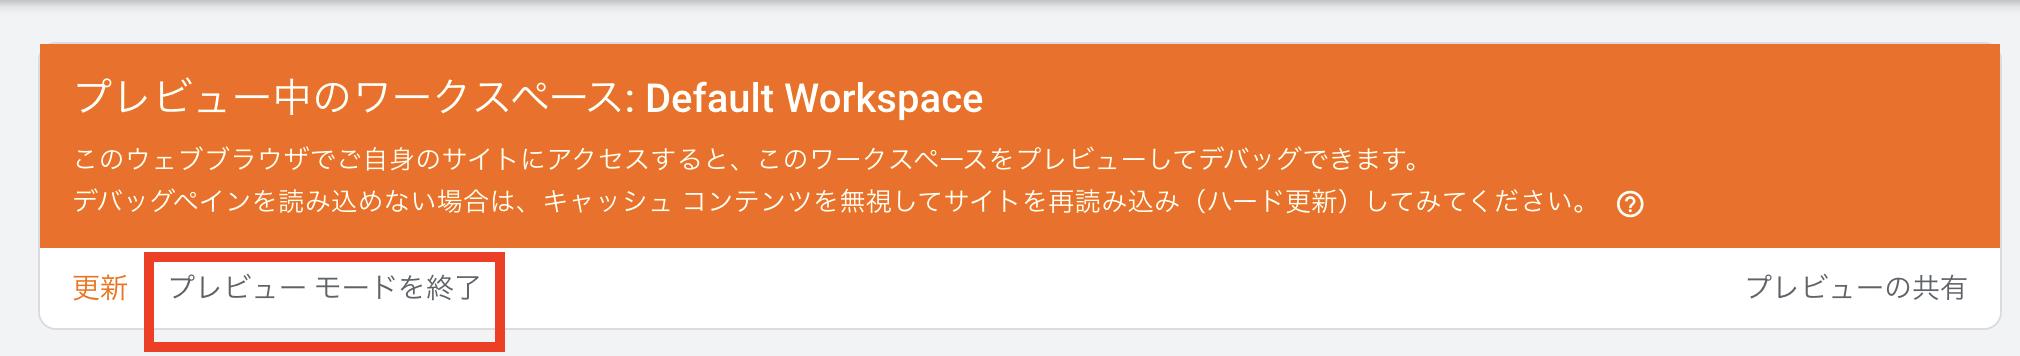 GTM_プレビューモード終了